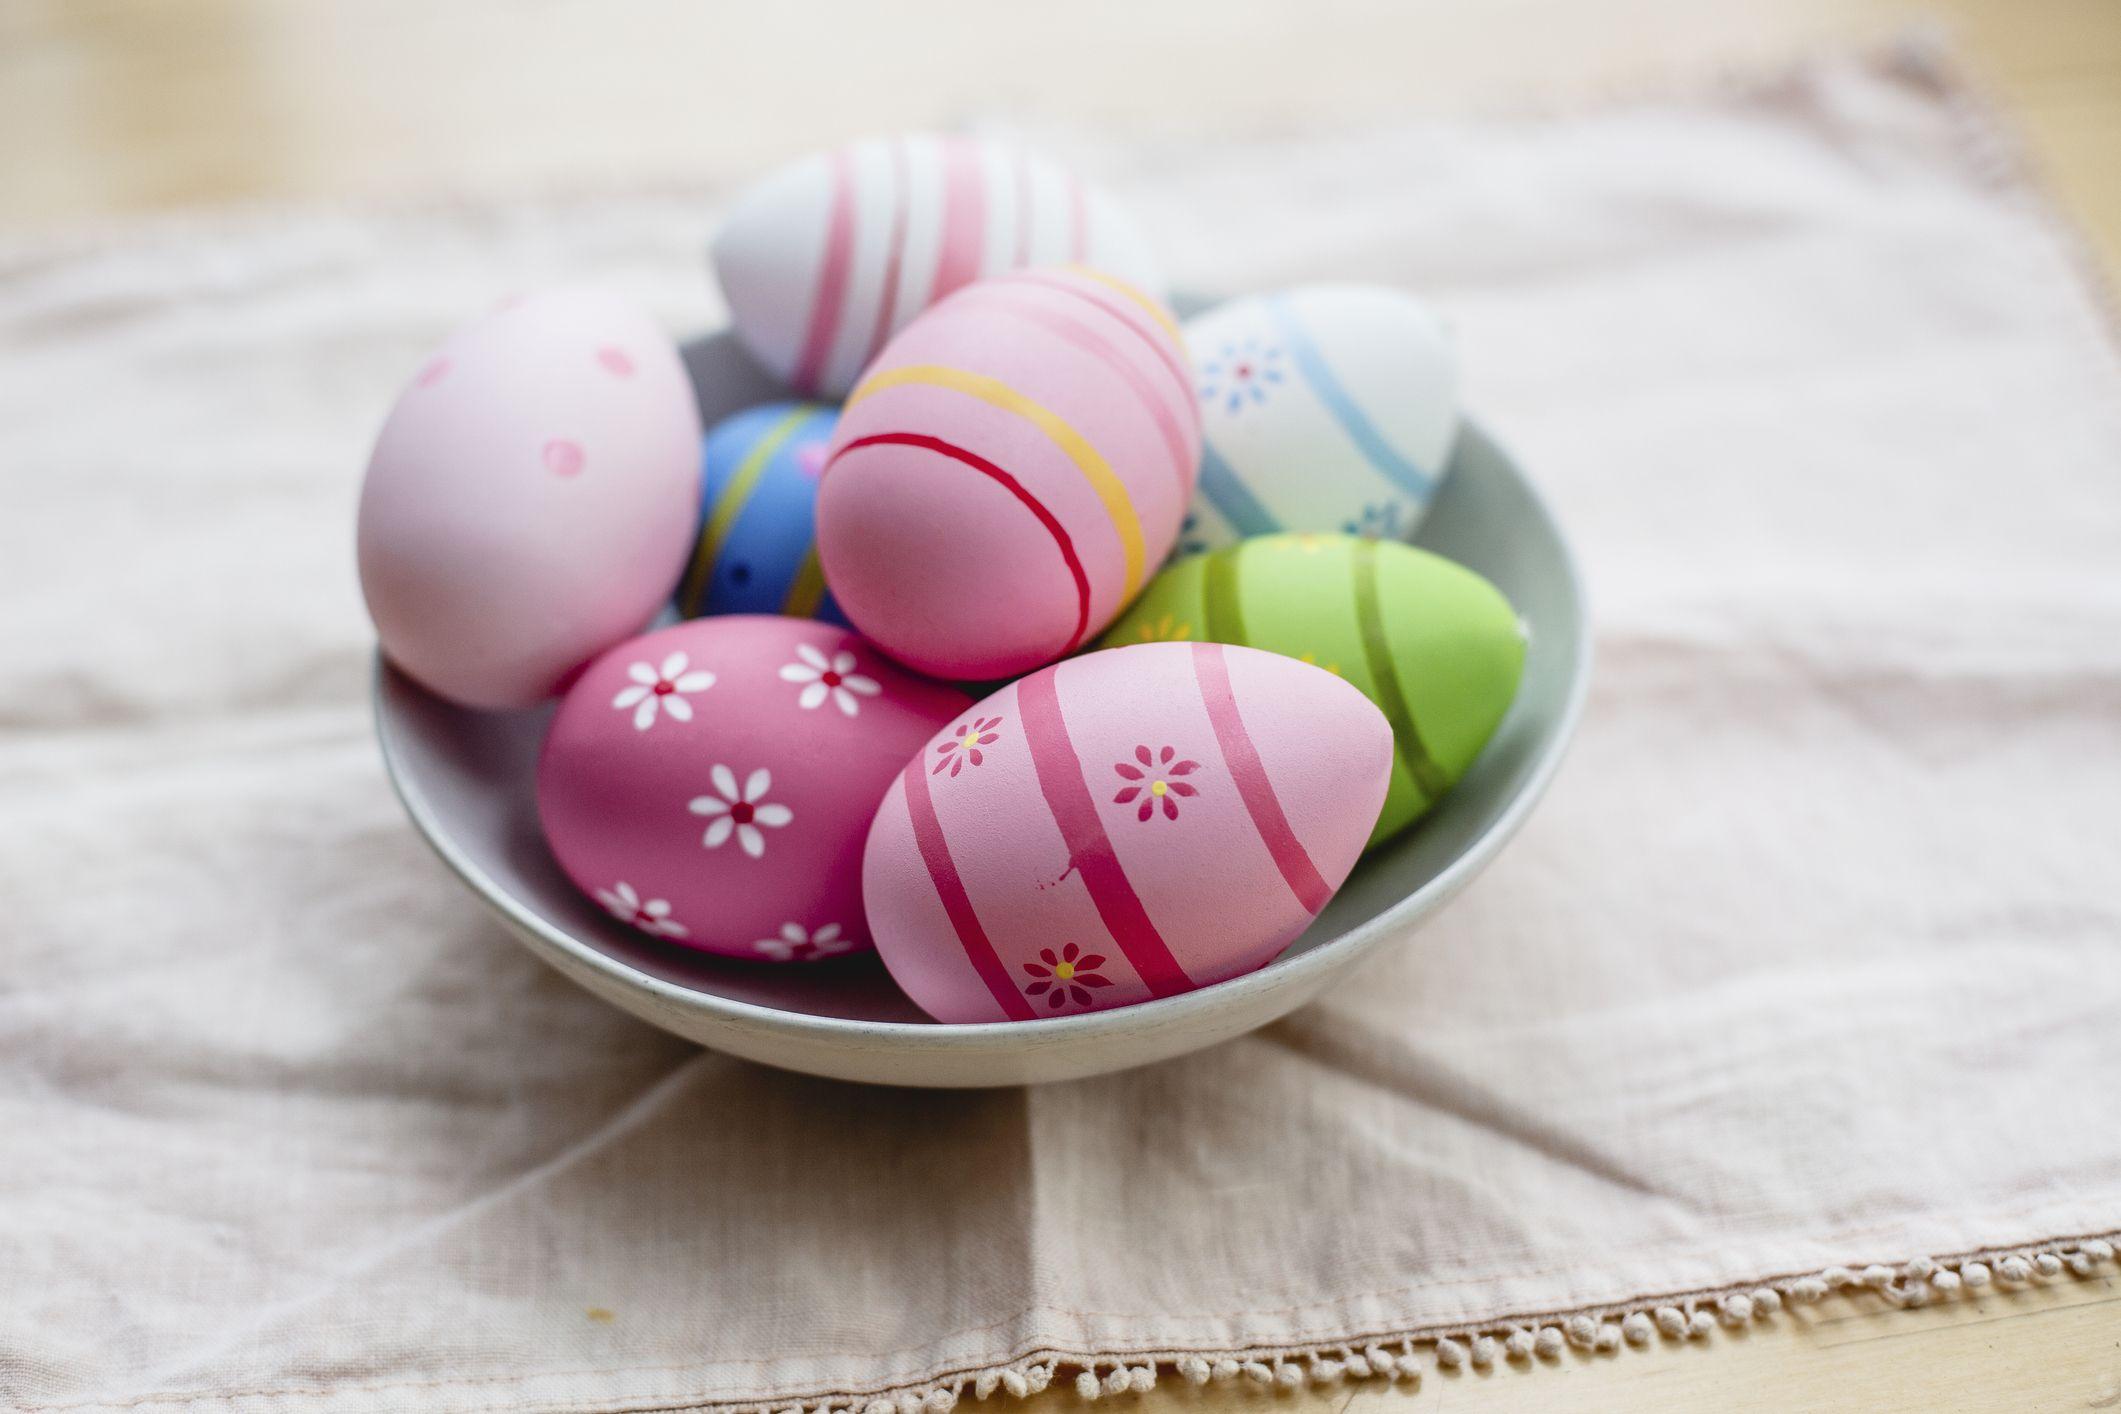 8 Easter Egg Decorating Ideas From Pinterest